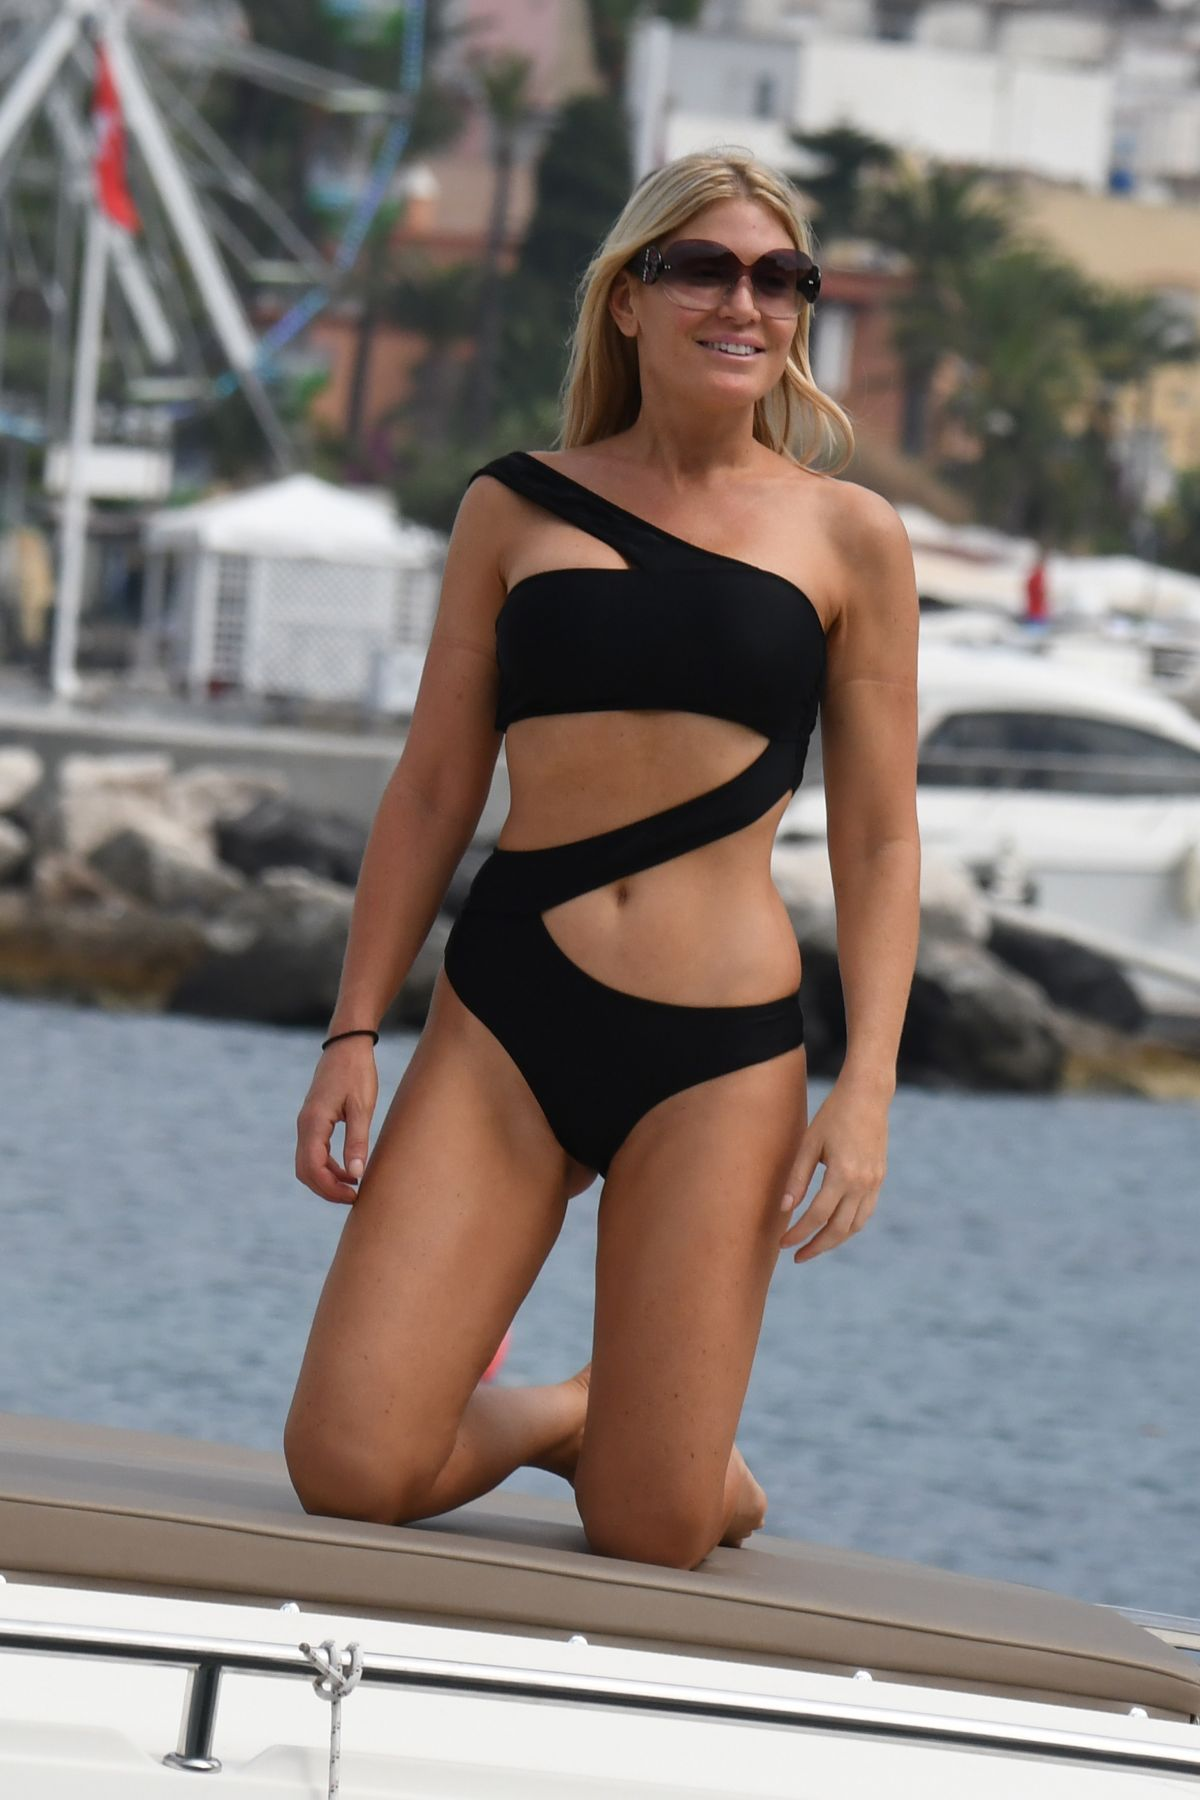 Bikini Hofit Golan nudes (88 photo), Pussy, Fappening, Boobs, braless 2018